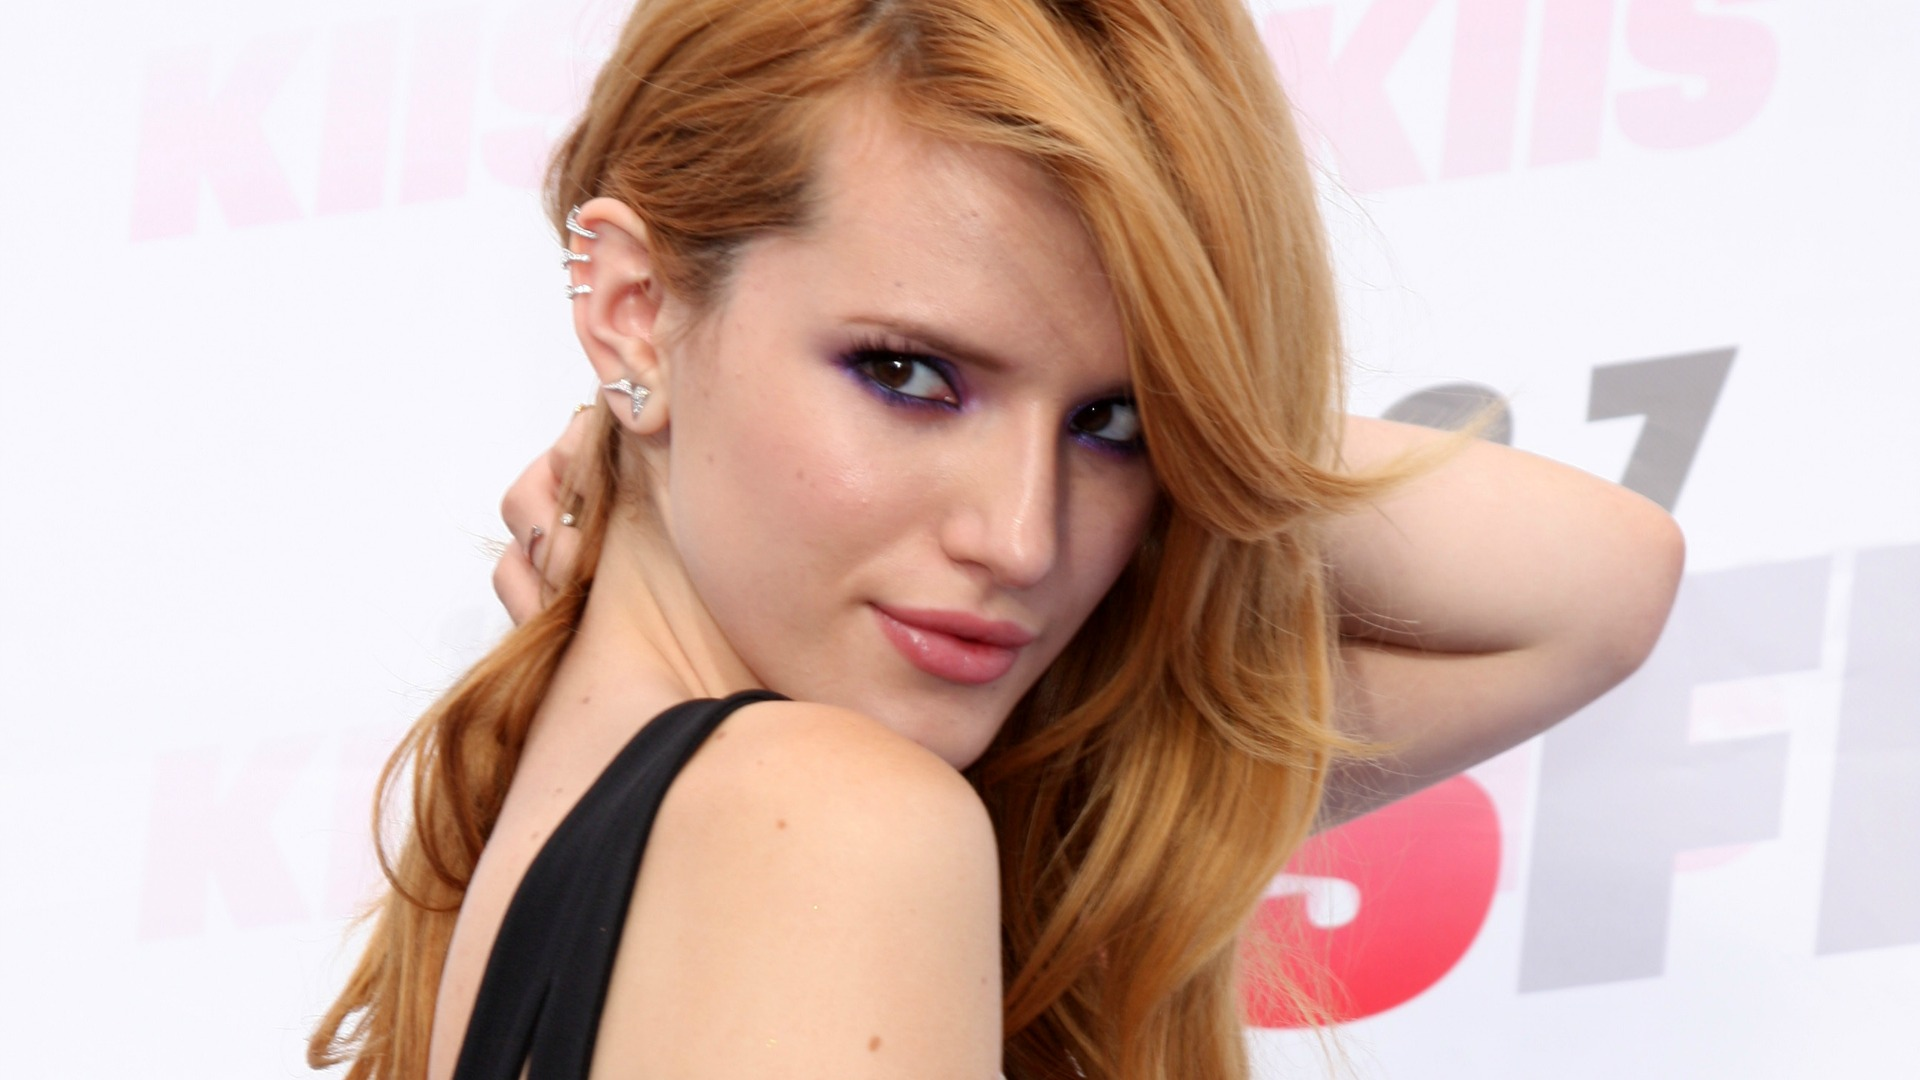 Bella Thorne made her boyfriend wait six weeks before kissing her